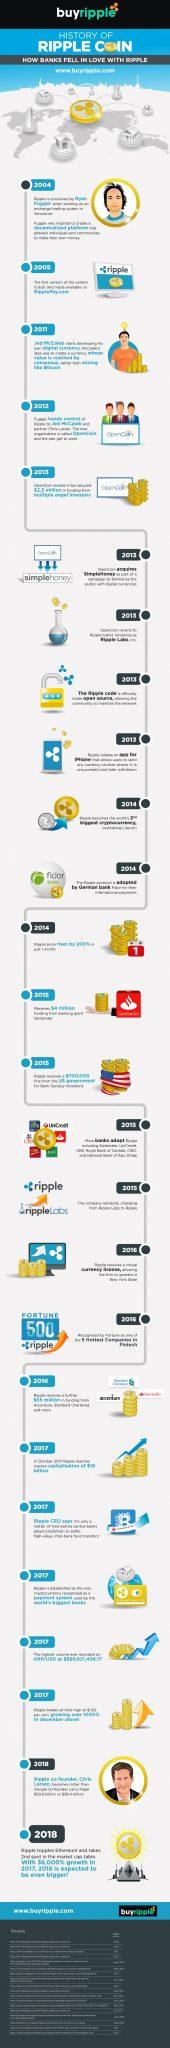 History of Ripple